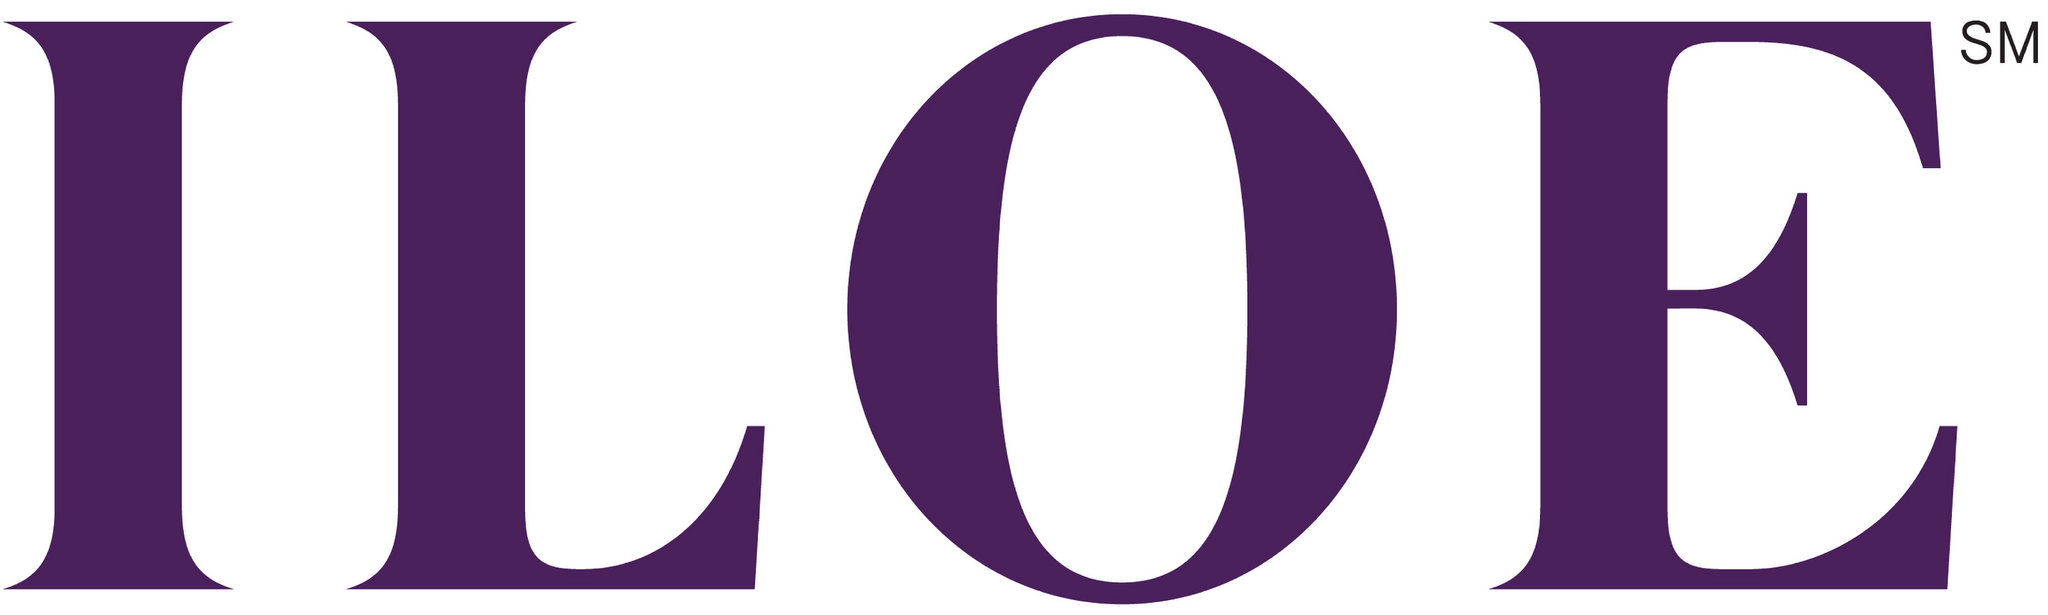 CRRM, Inc. DBA ILOE